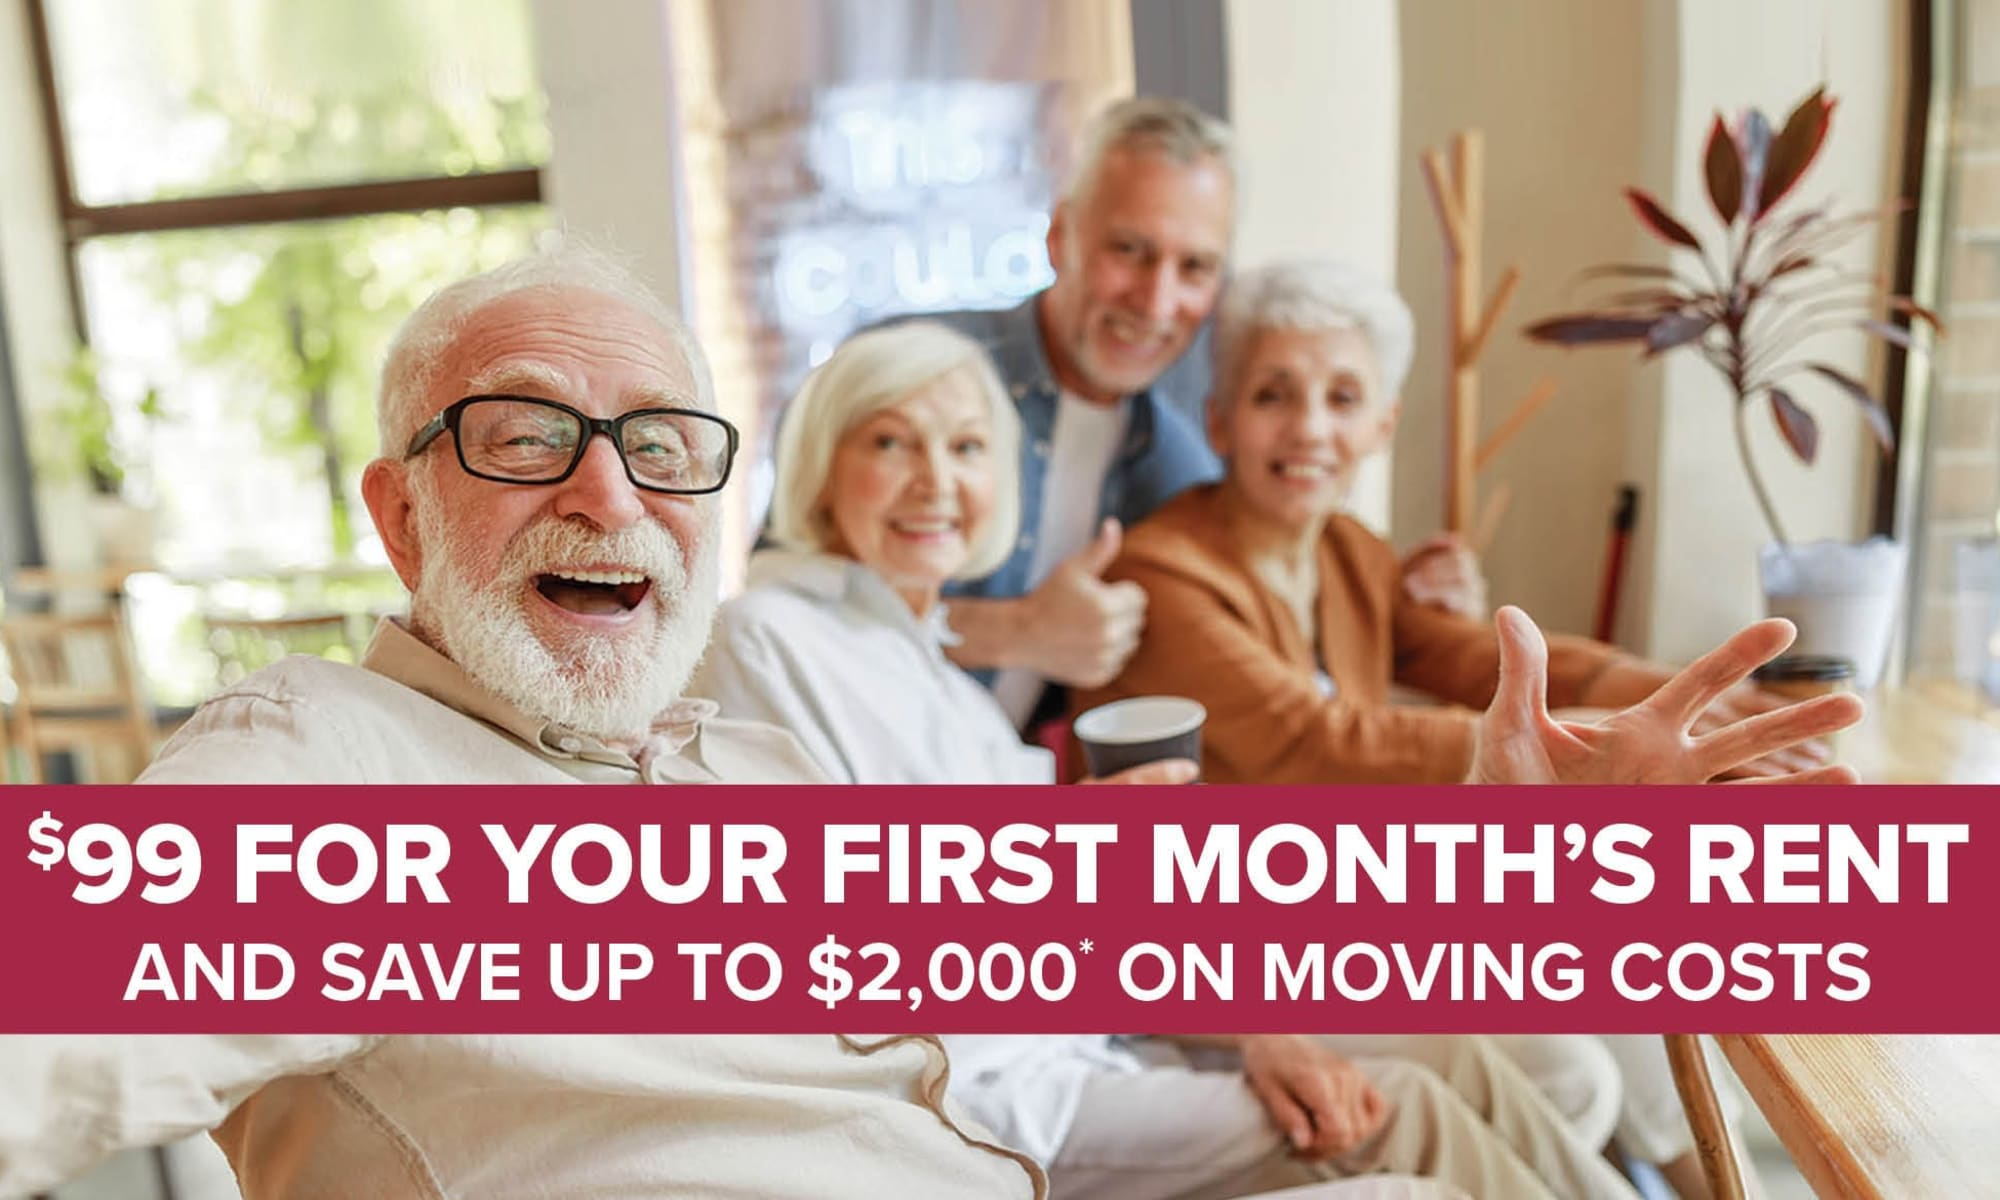 Portage senior living has amazing care options